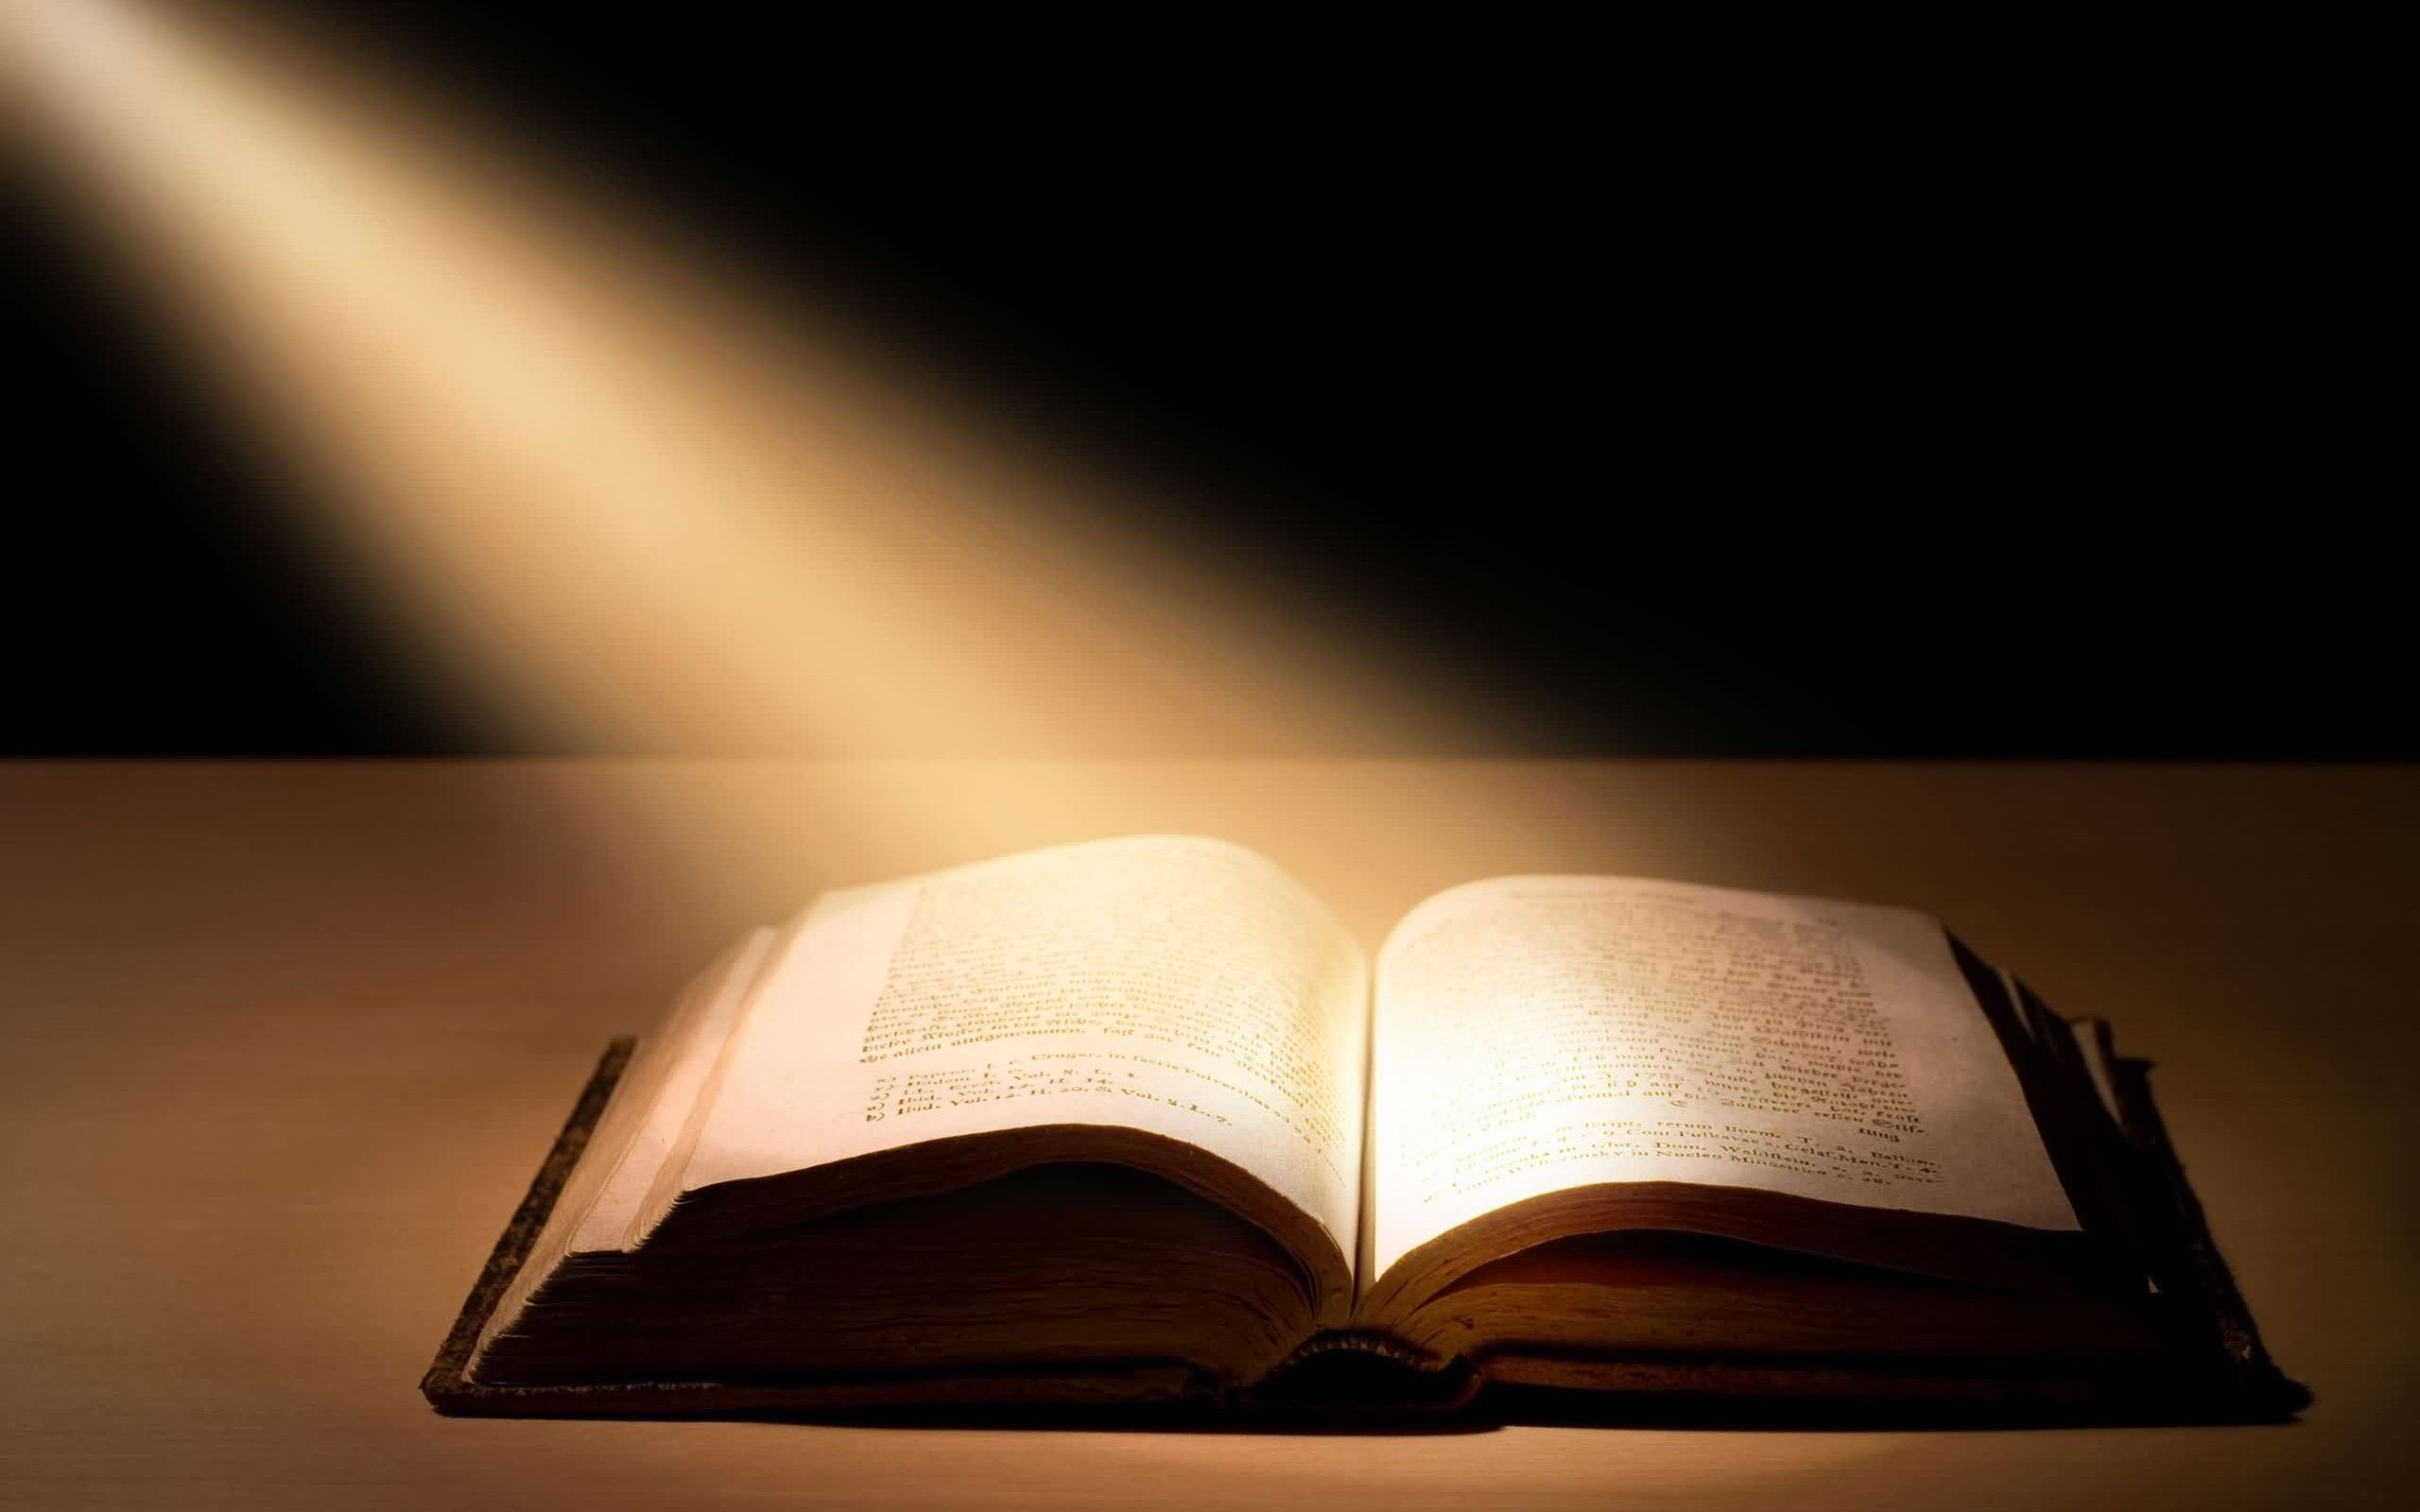 77 Christian Wallpapers Christian Backgrounds King James Bible Christian Bible Holy Bible